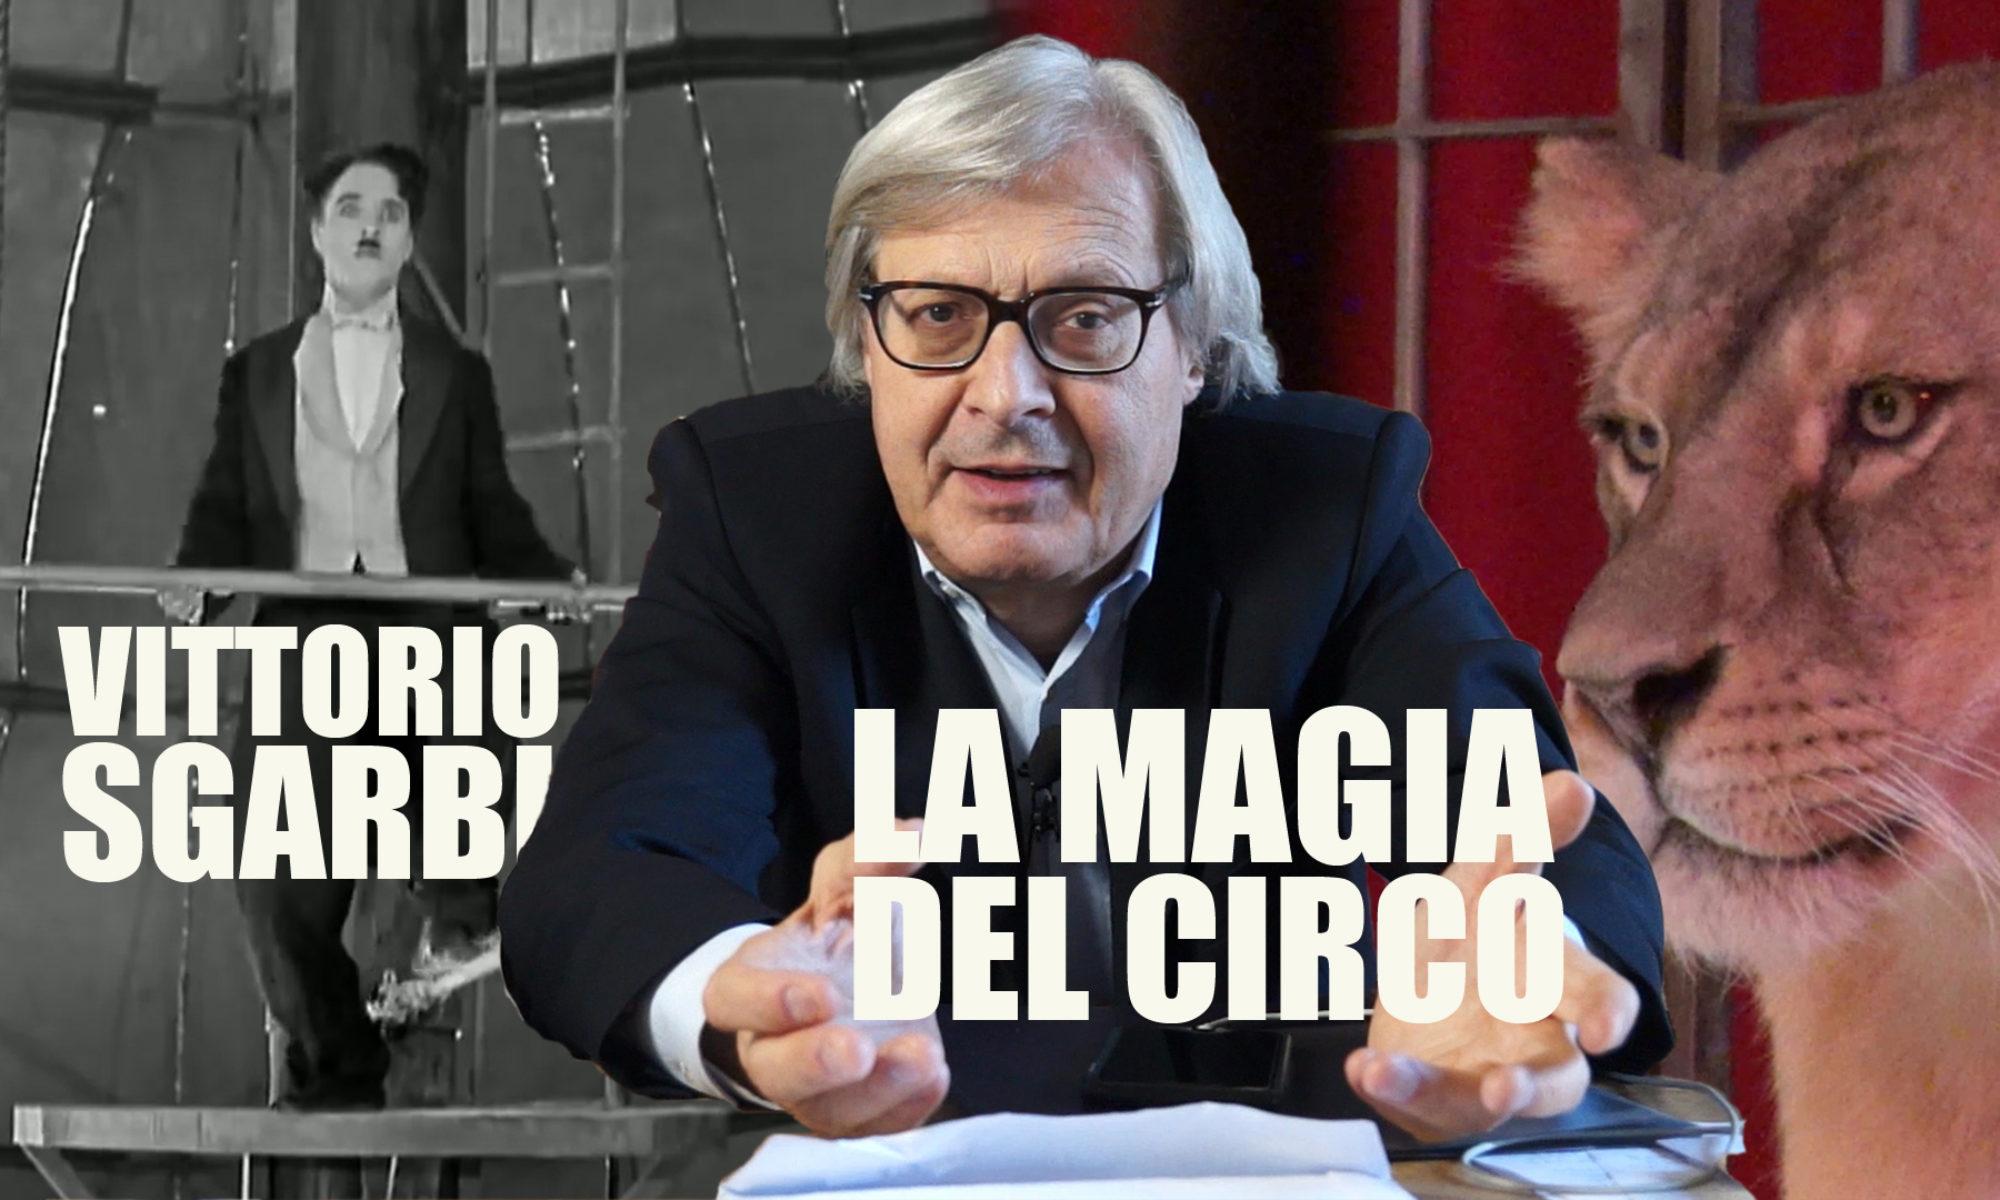 Ottantanovesima puntata. Vittorio Sgarbi e la magìa del circo